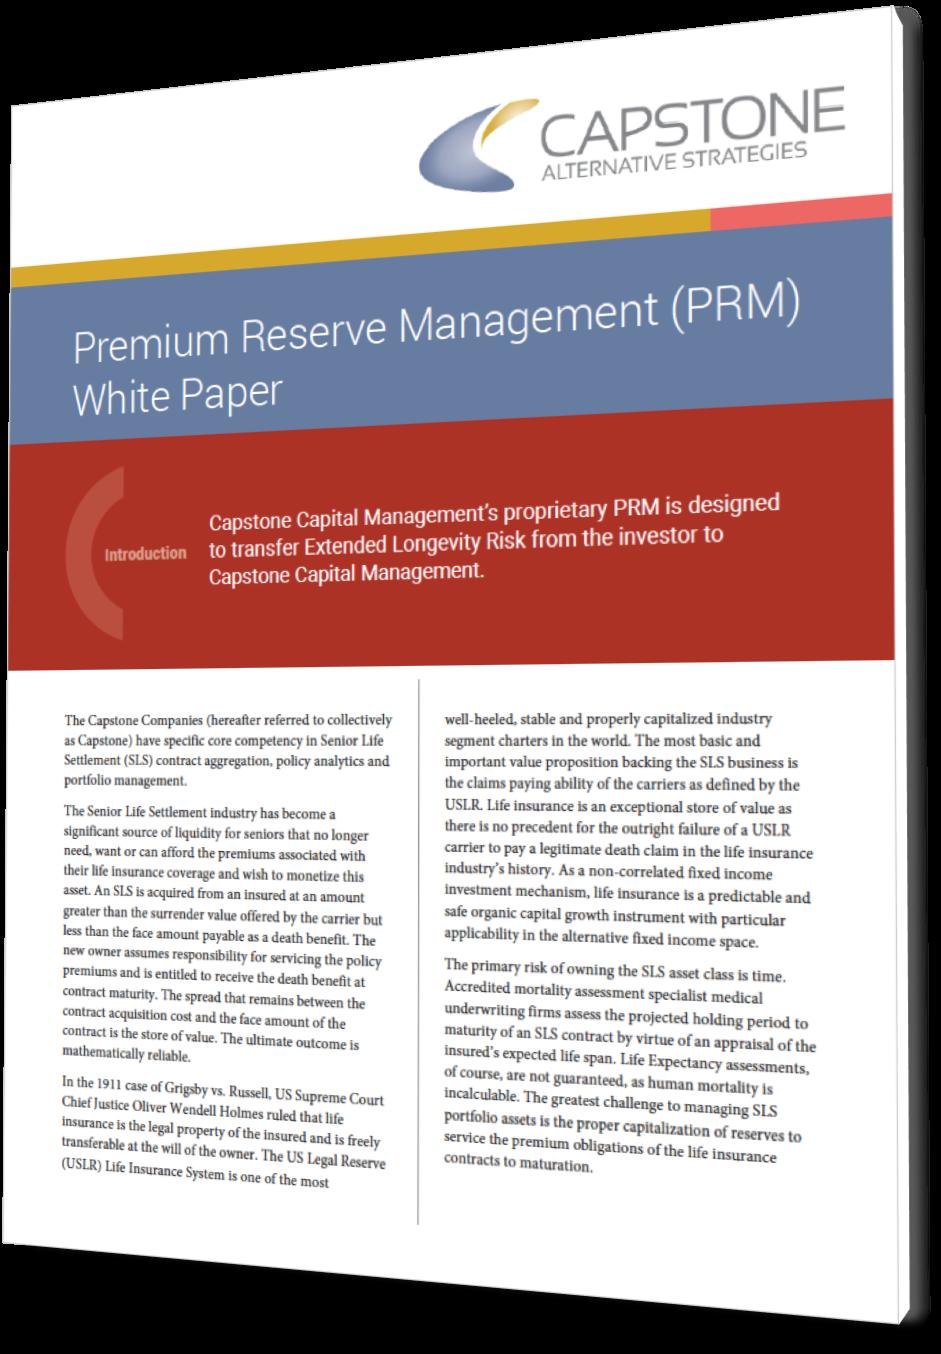 PRM Whitepaper Cover